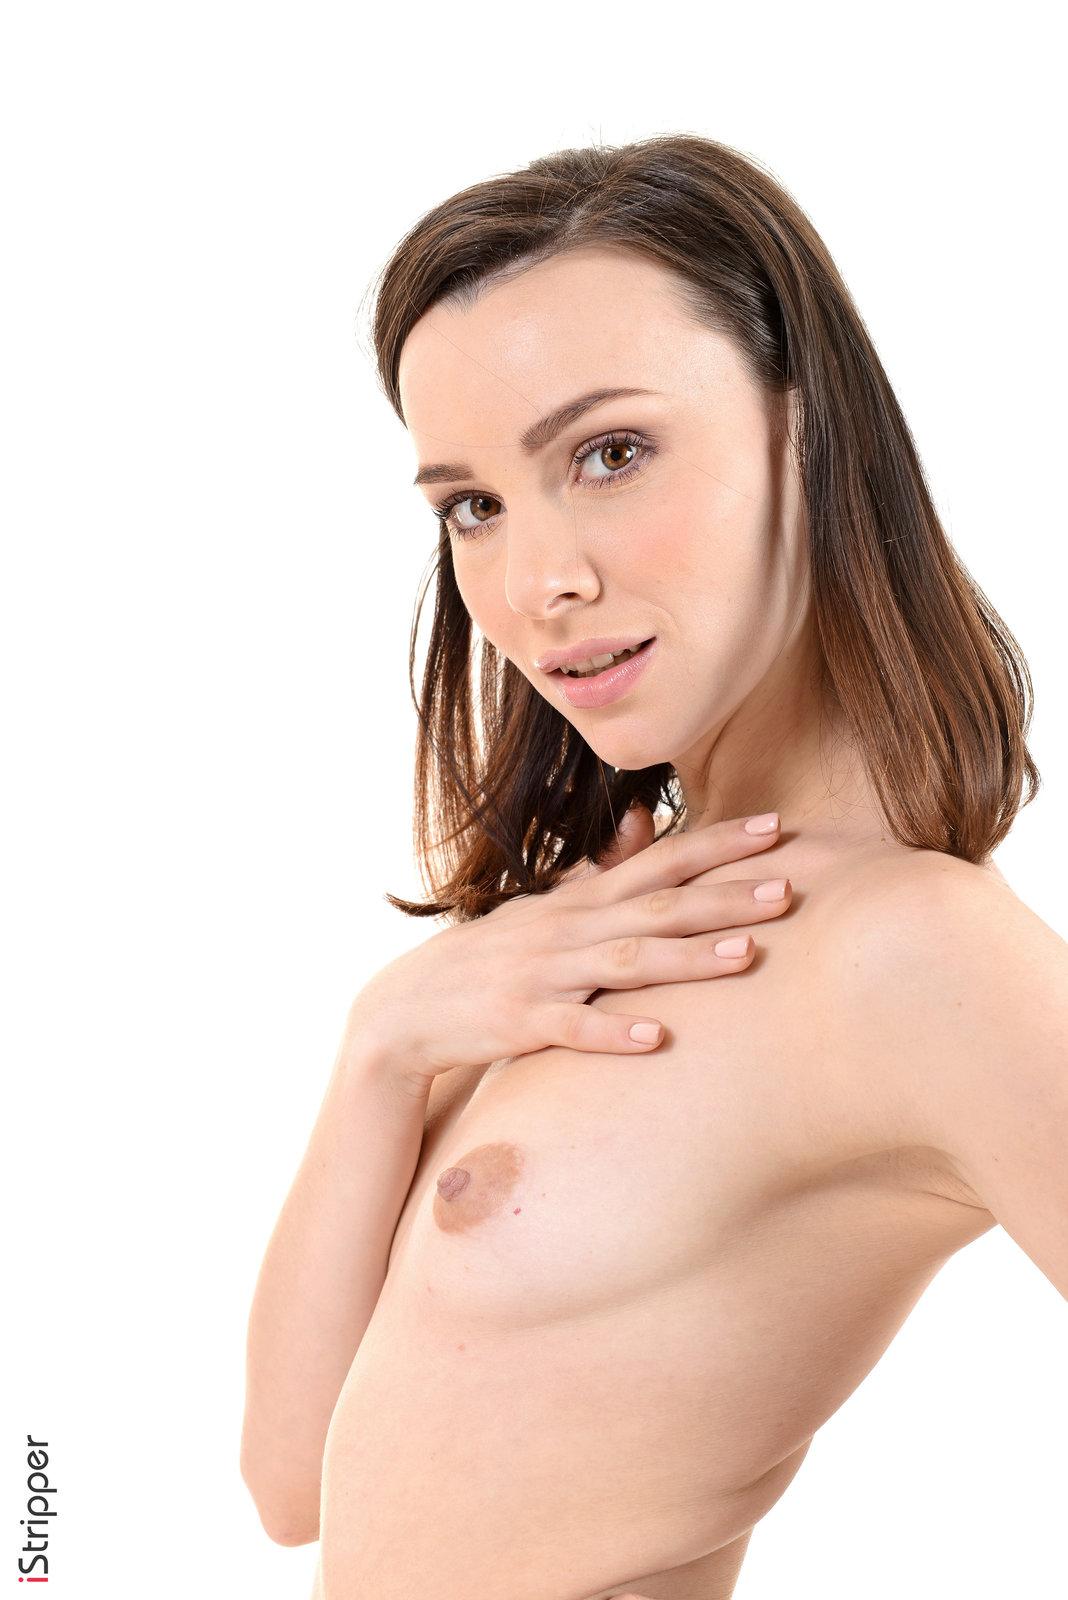 Zdjęcie porno - 0817 - Zgrabna laska zdejmuje spódniczkę